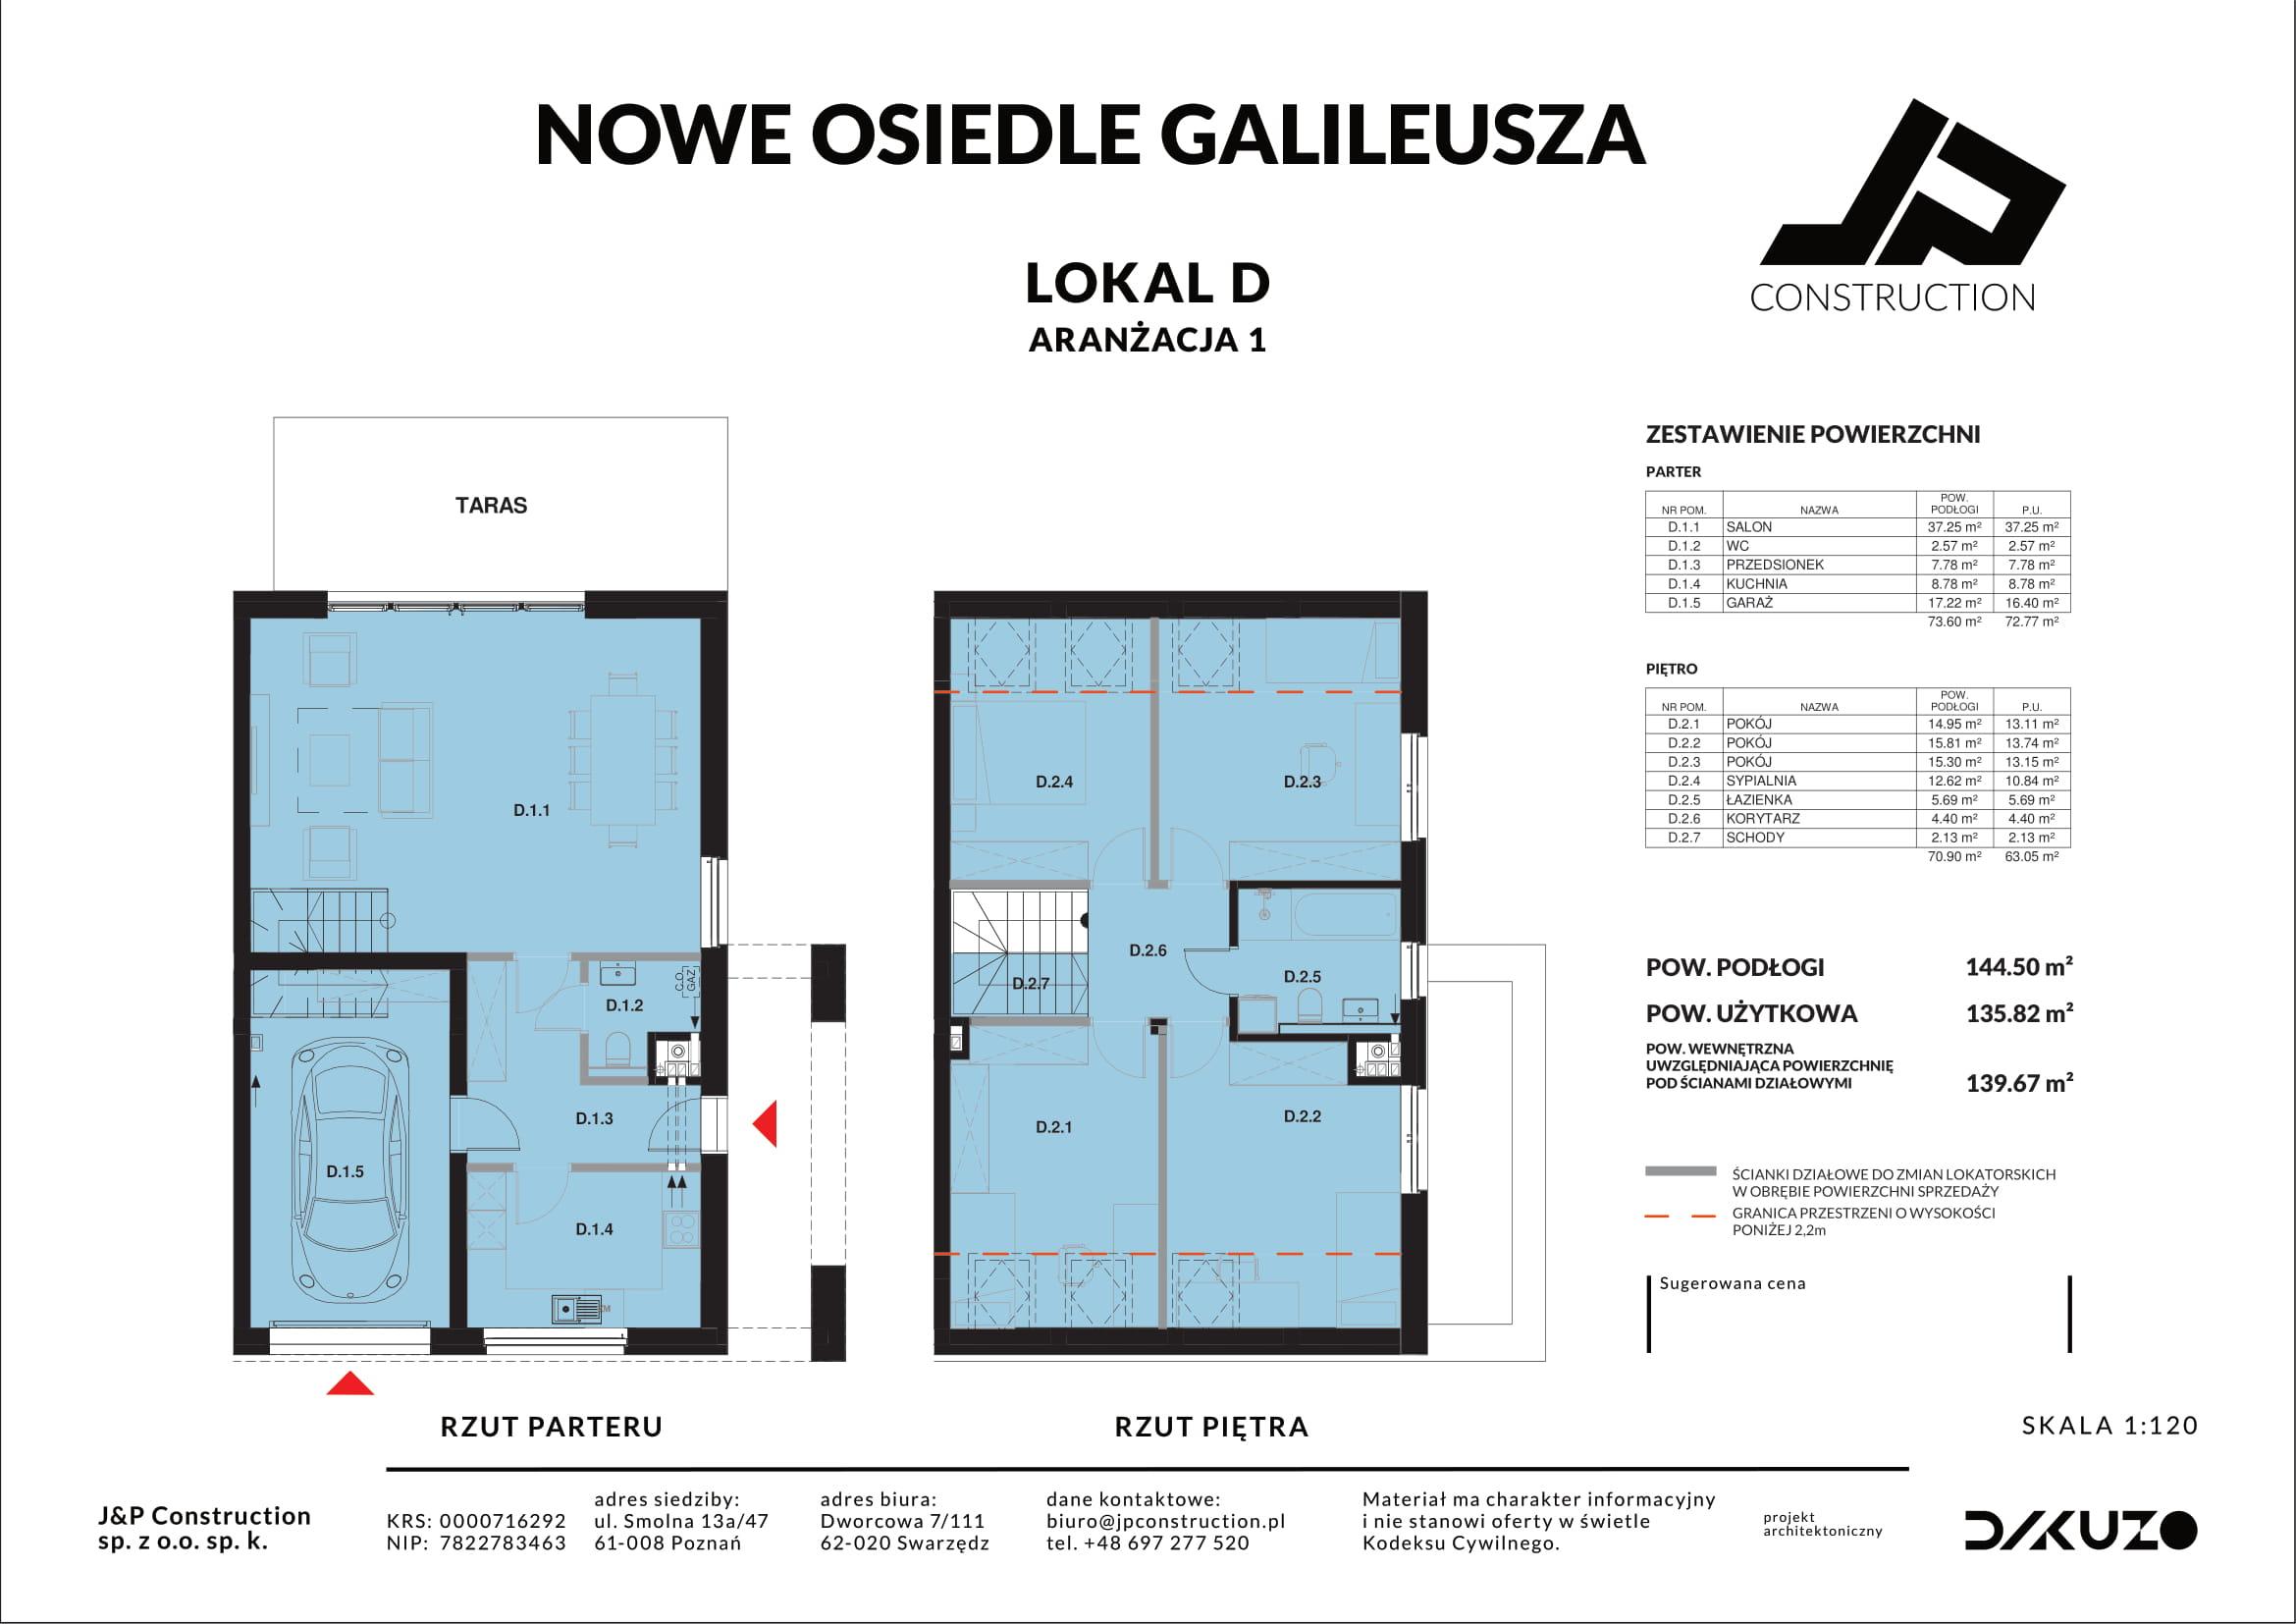 ZALASEWO-GAL-KARTA-LOKAL-D-aranzacja-1-1